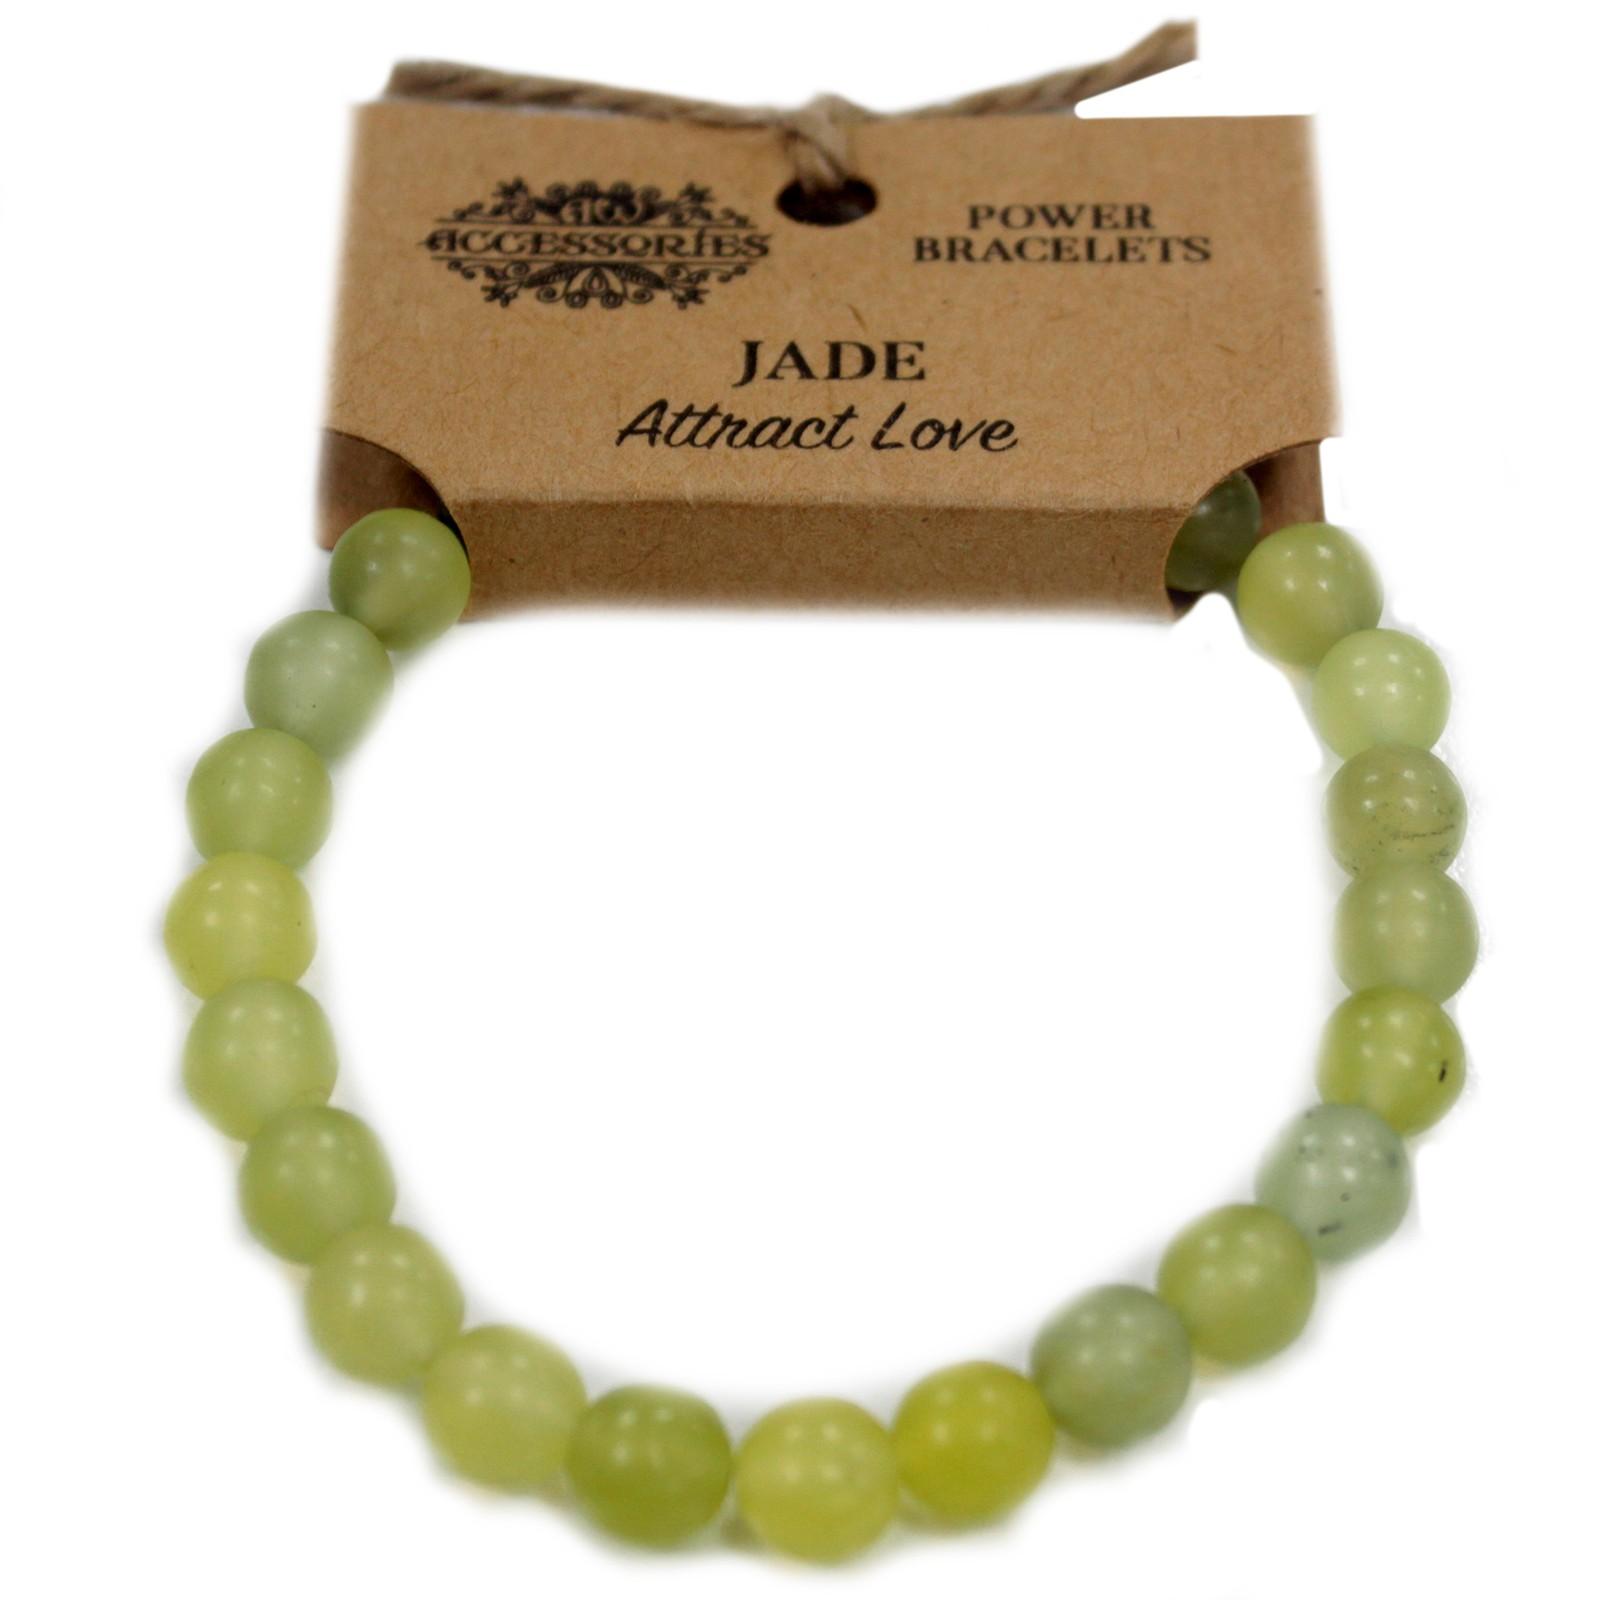 Power Bracelet Jade